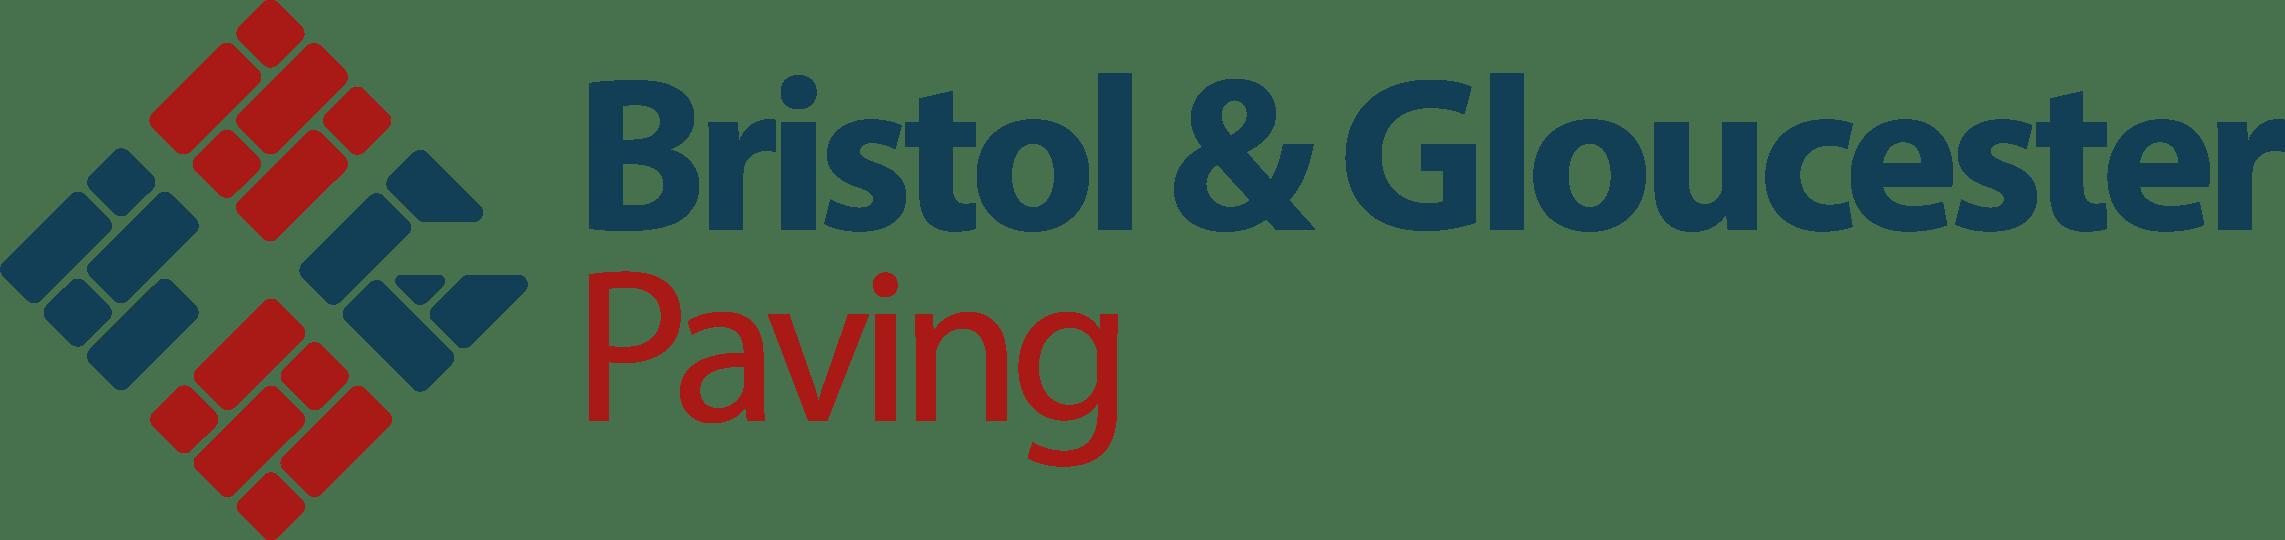 Bristol & Gloucester Paving